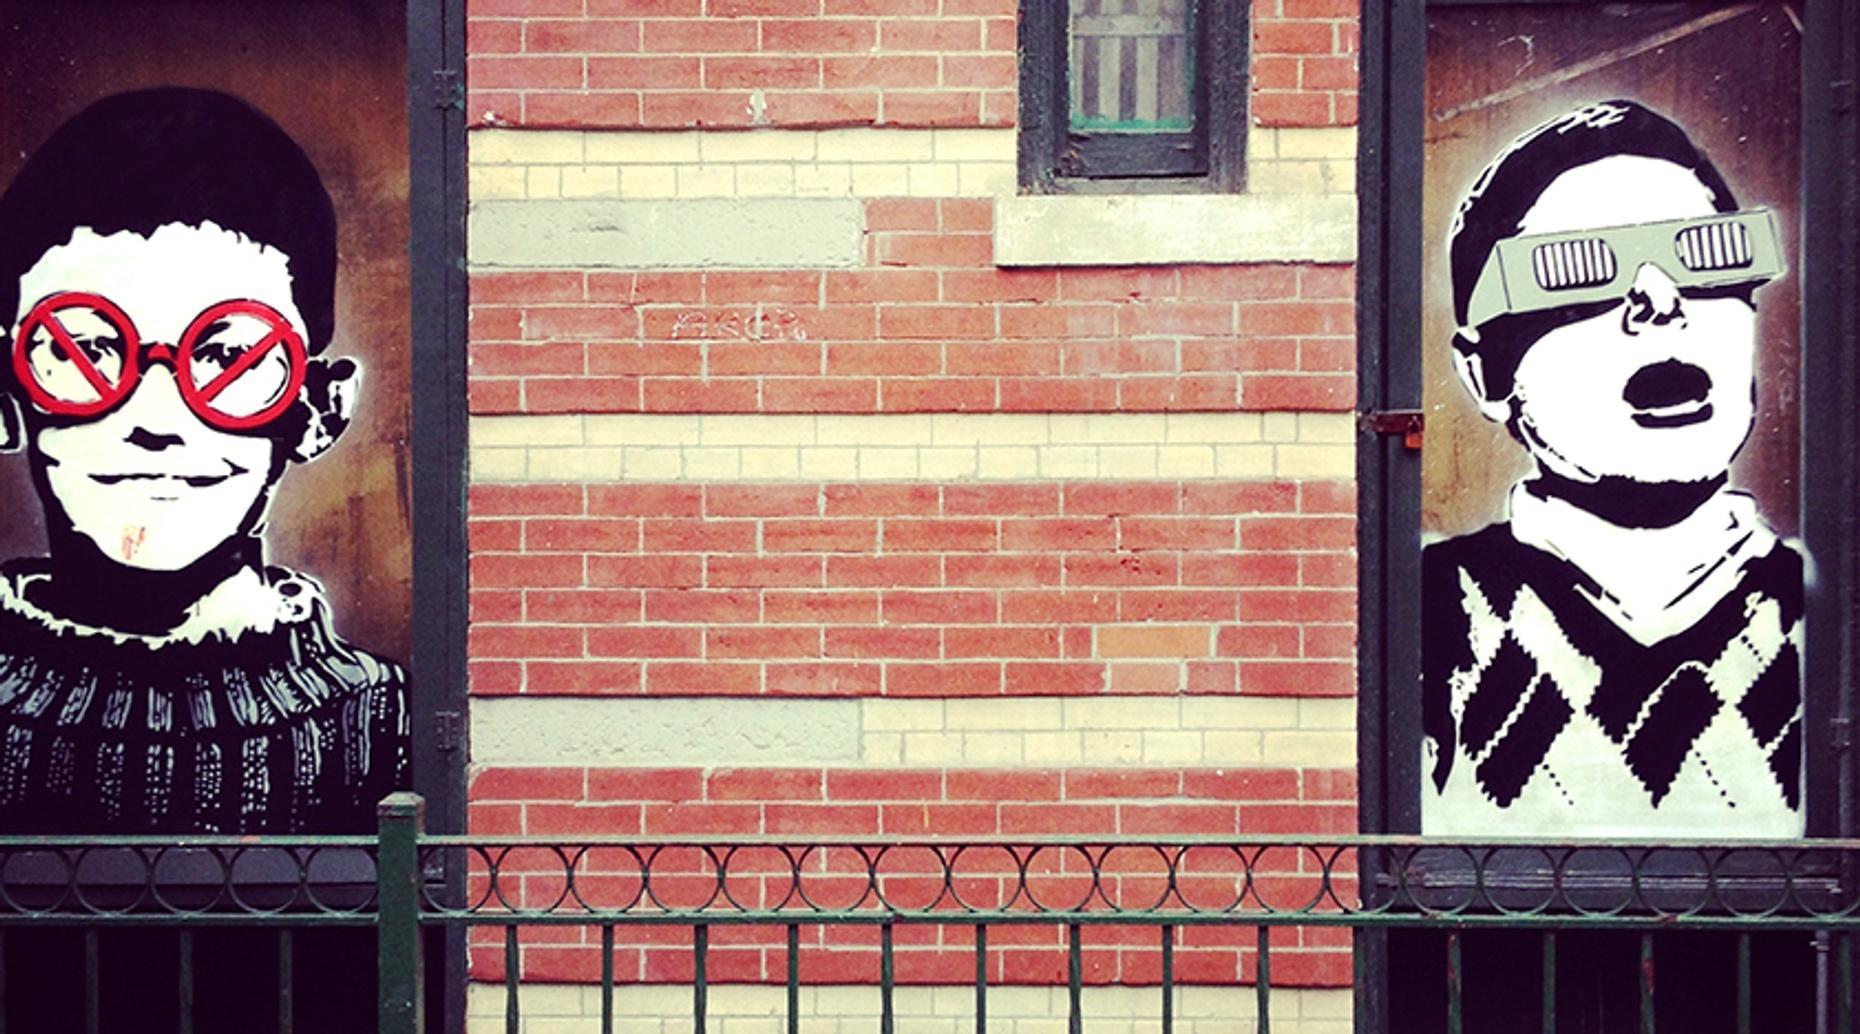 Brooklyn Graffiti to Galleries Tour